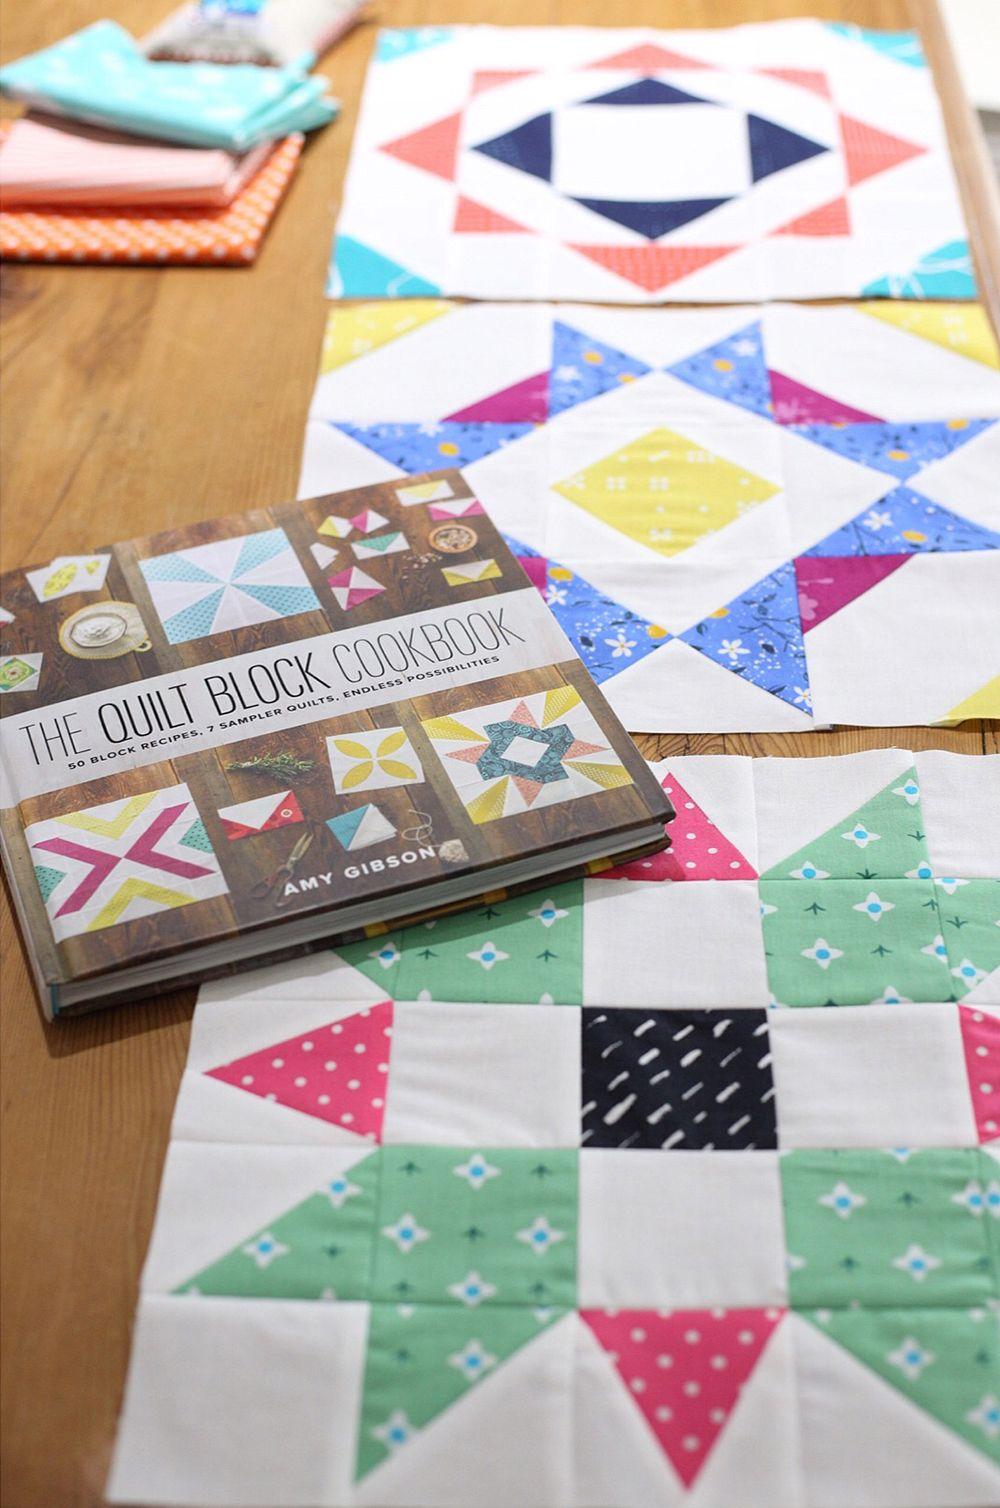 The Quilt Block Cookbook by Amy Gibson : Fresh Lemons Quilts ... : the quilt sampler - Adamdwight.com